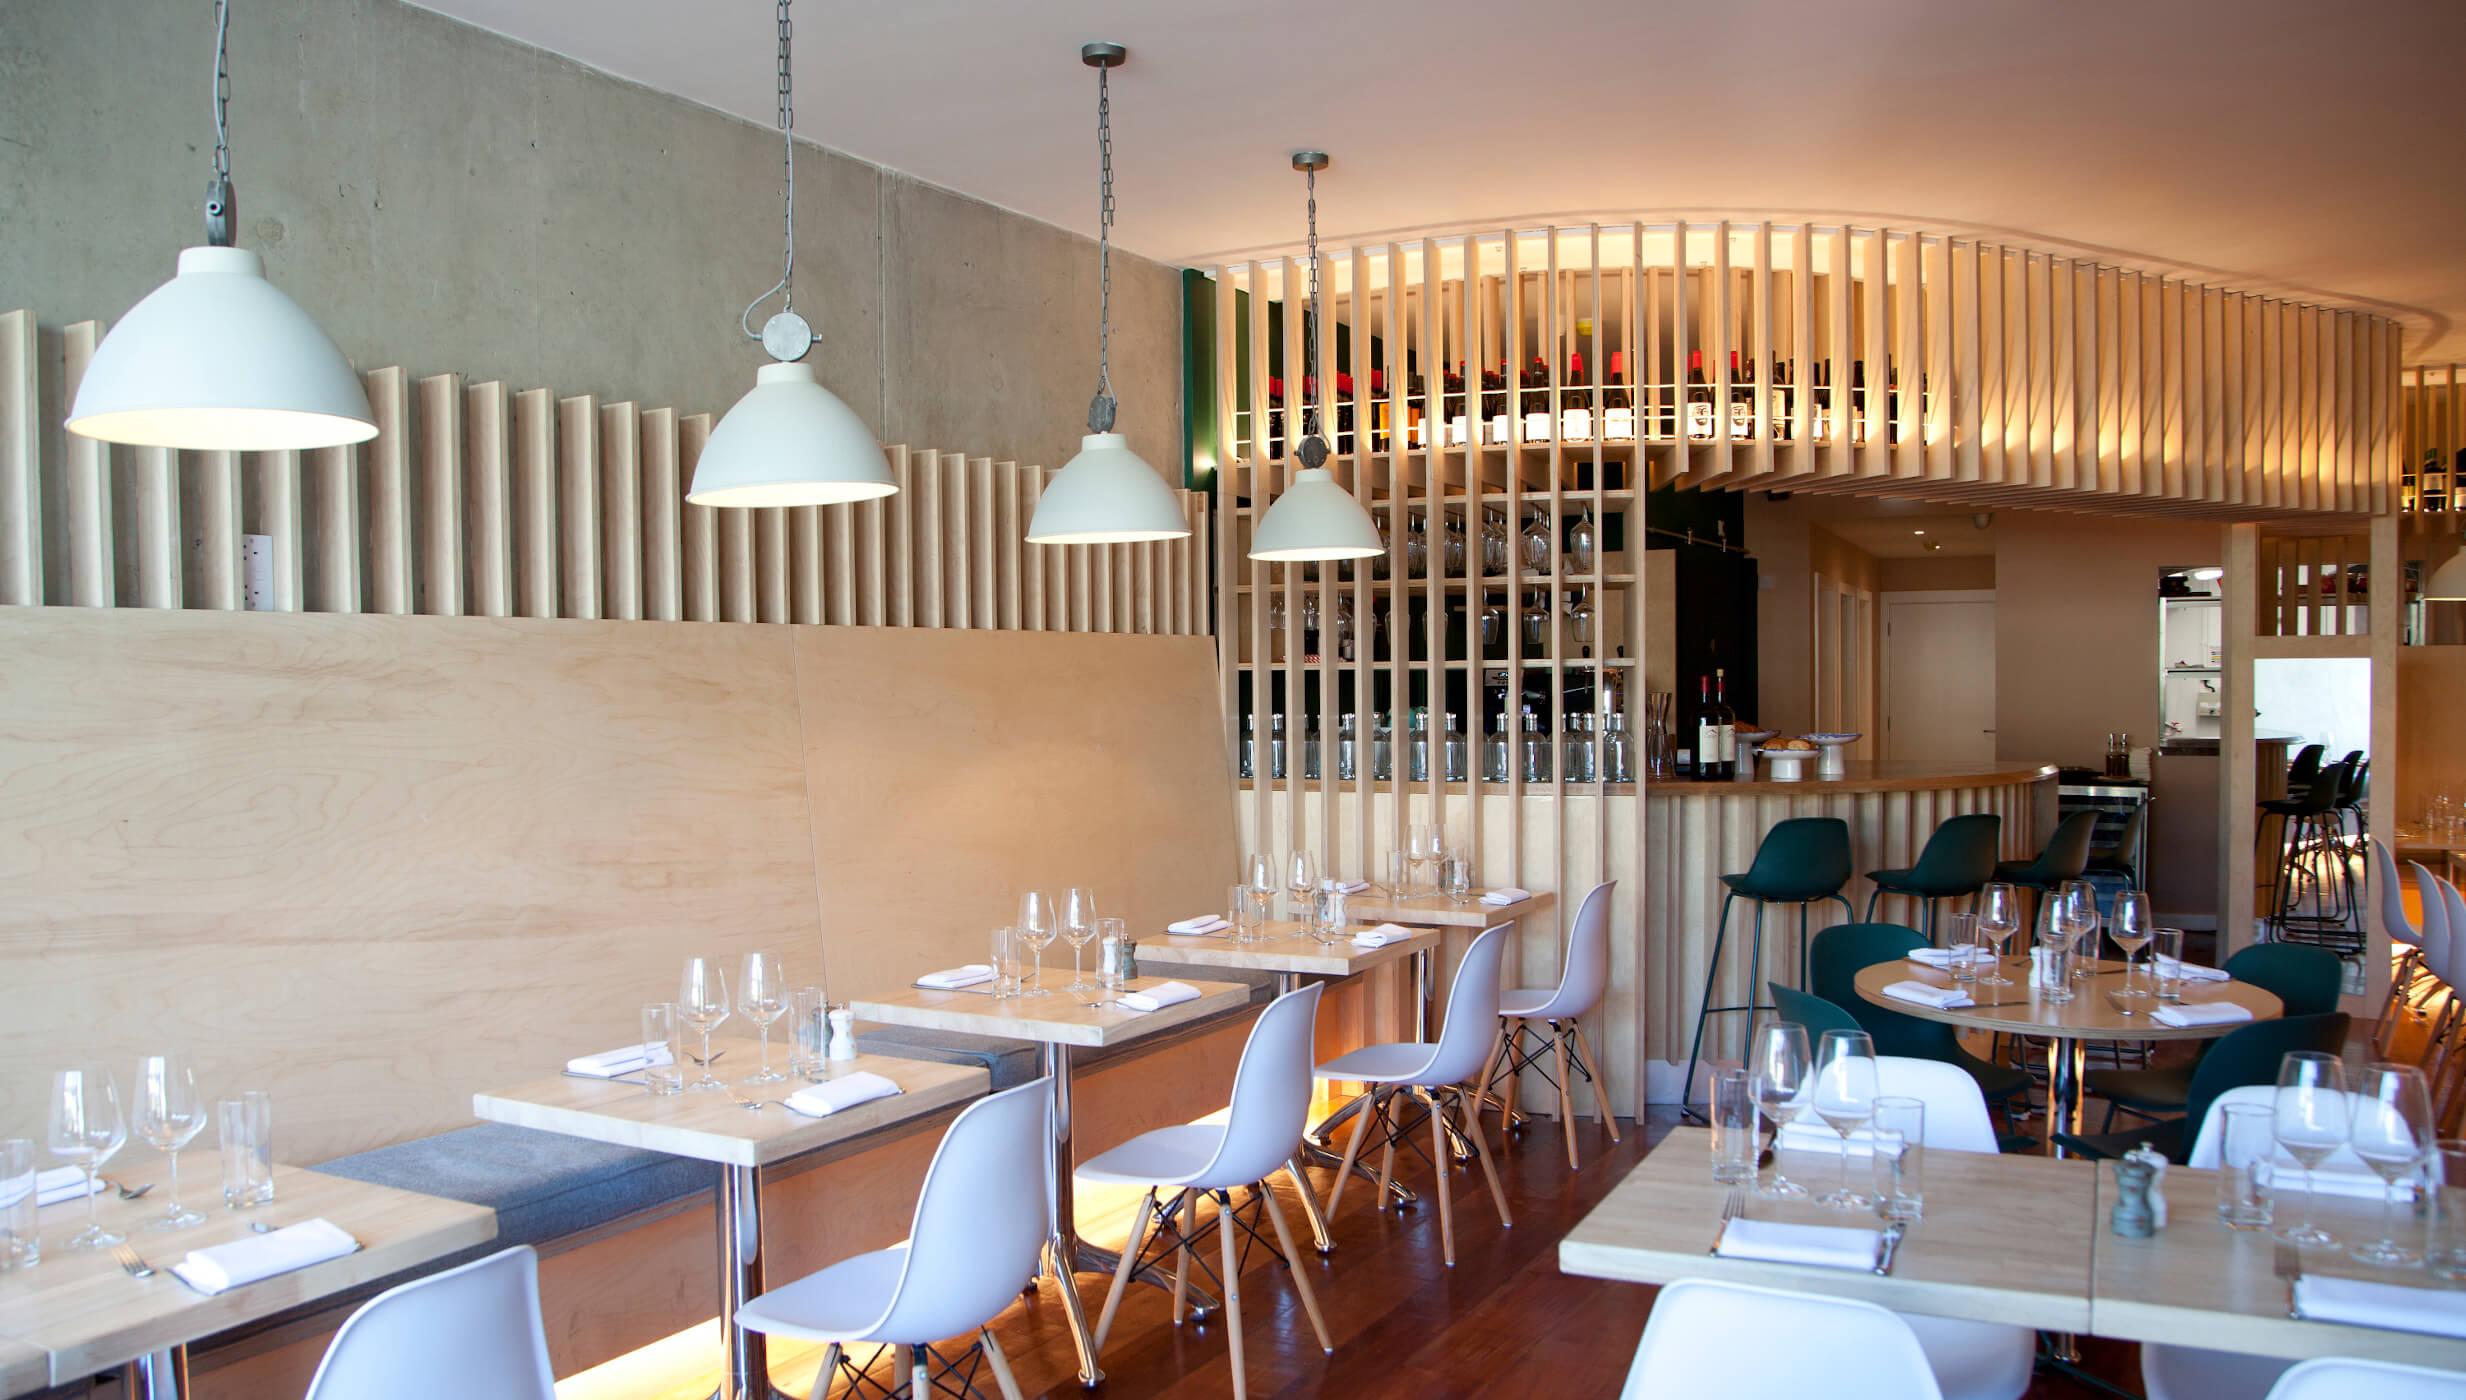 Woodruff Restaurant